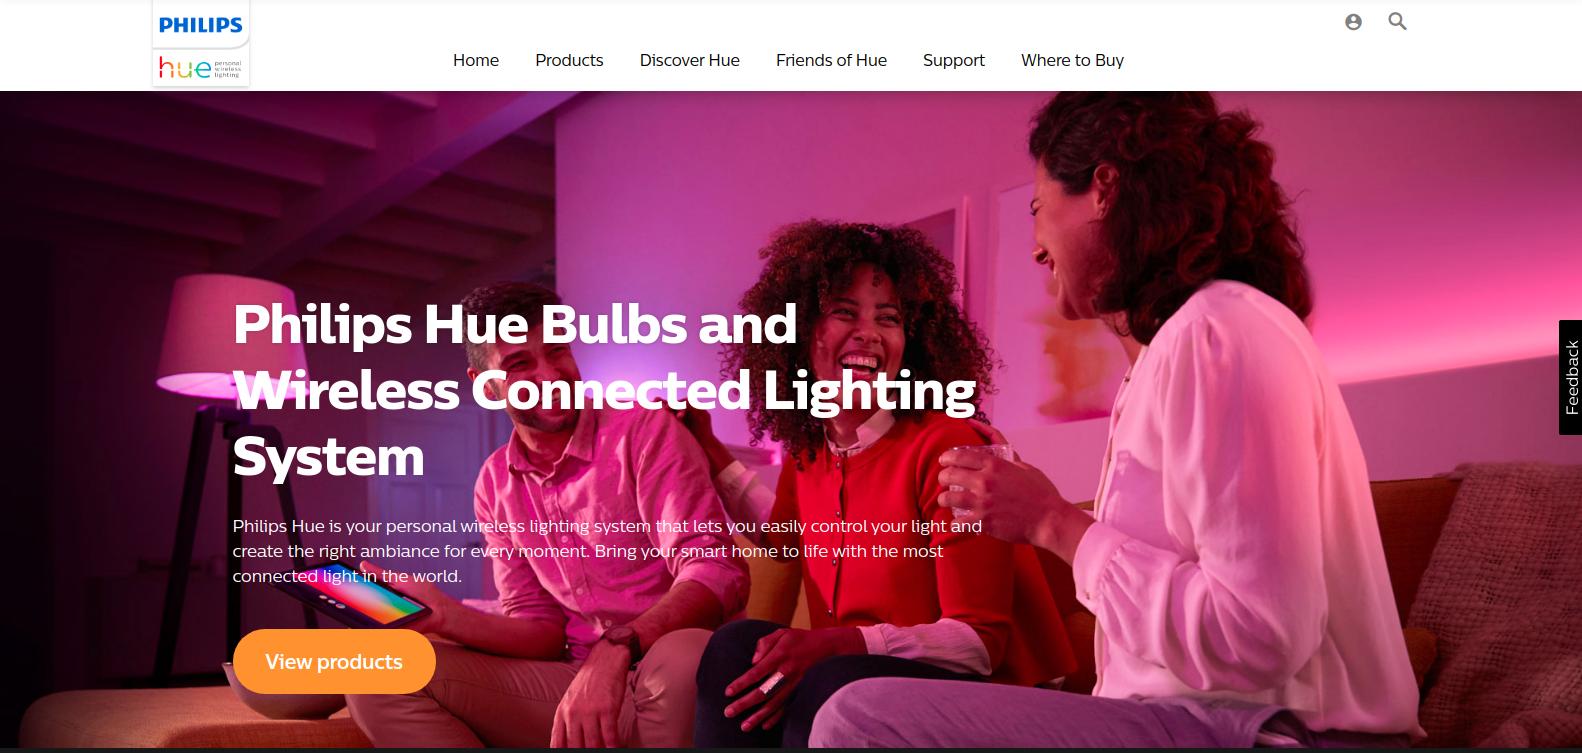 Philips Hue Homepage